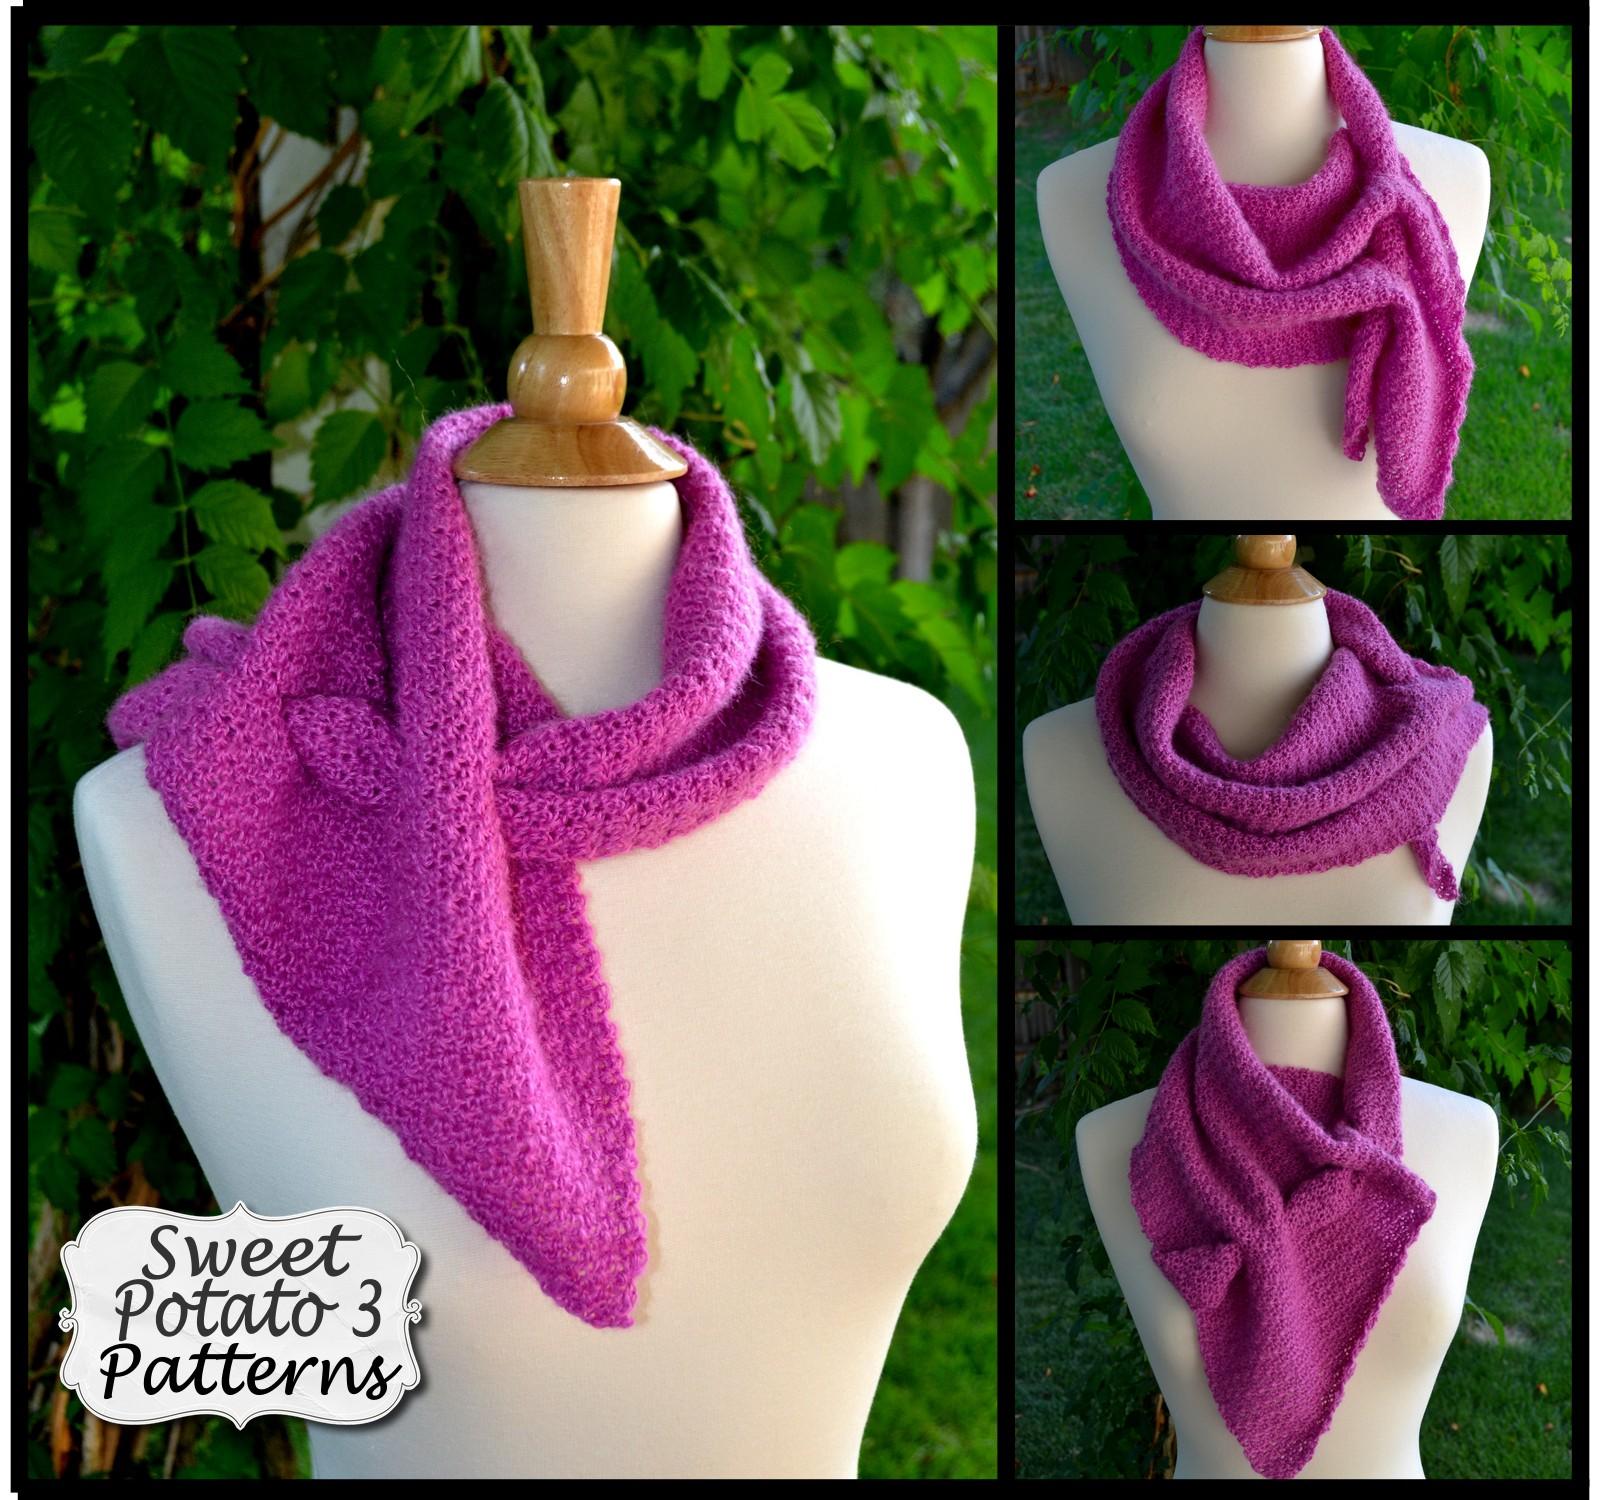 Interlace Scarf and Wrap Crochet Pattern